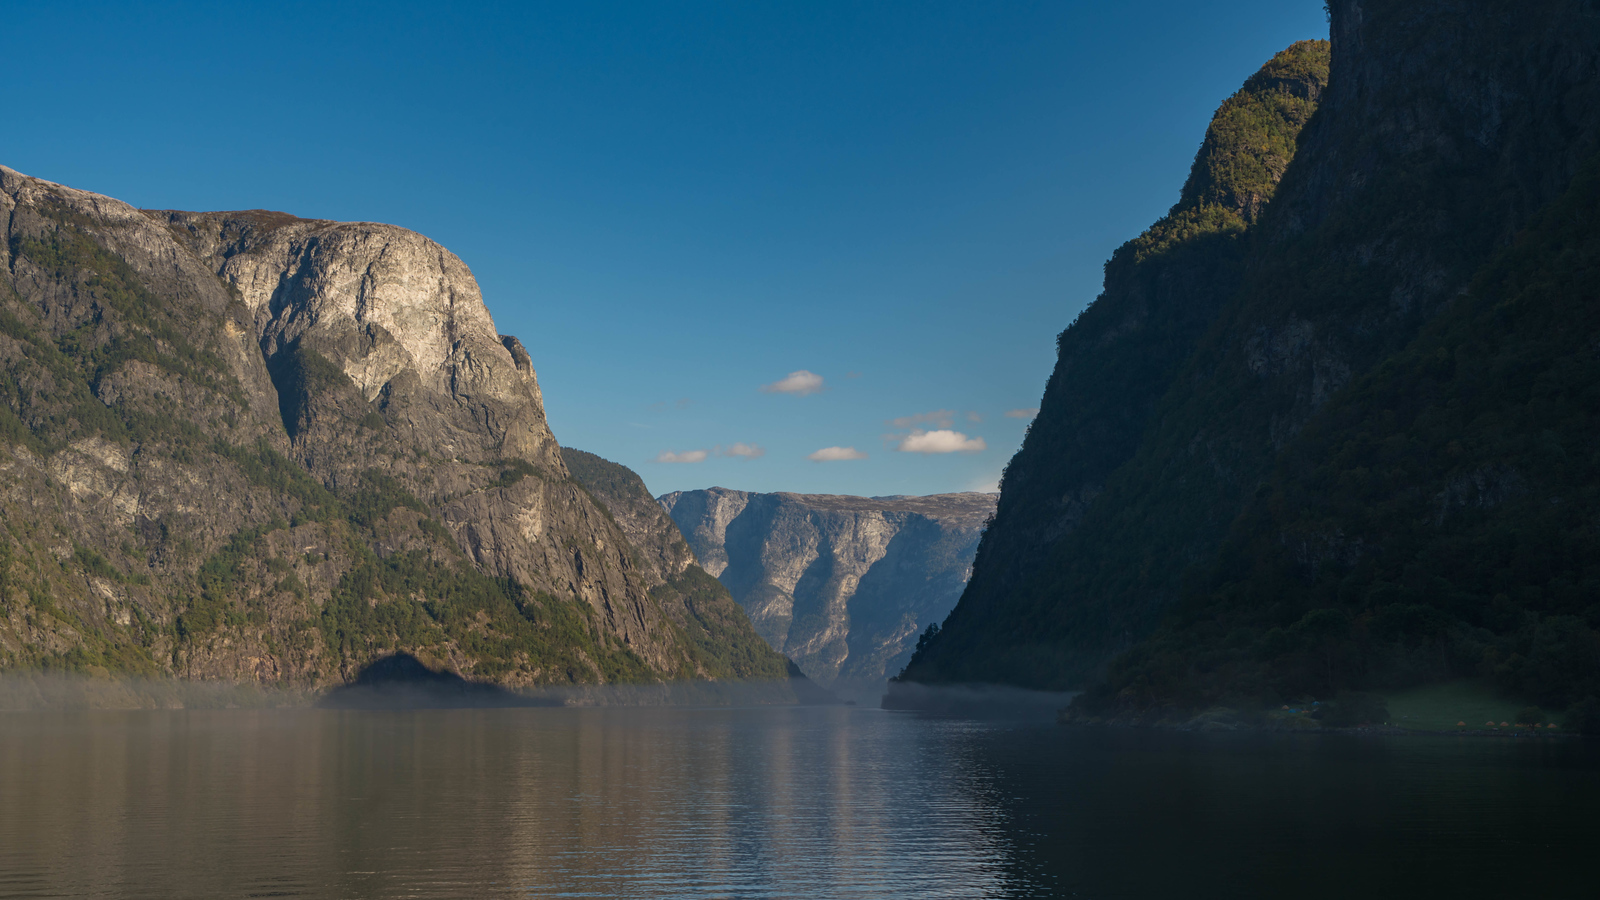 Norway in a Nutshell views